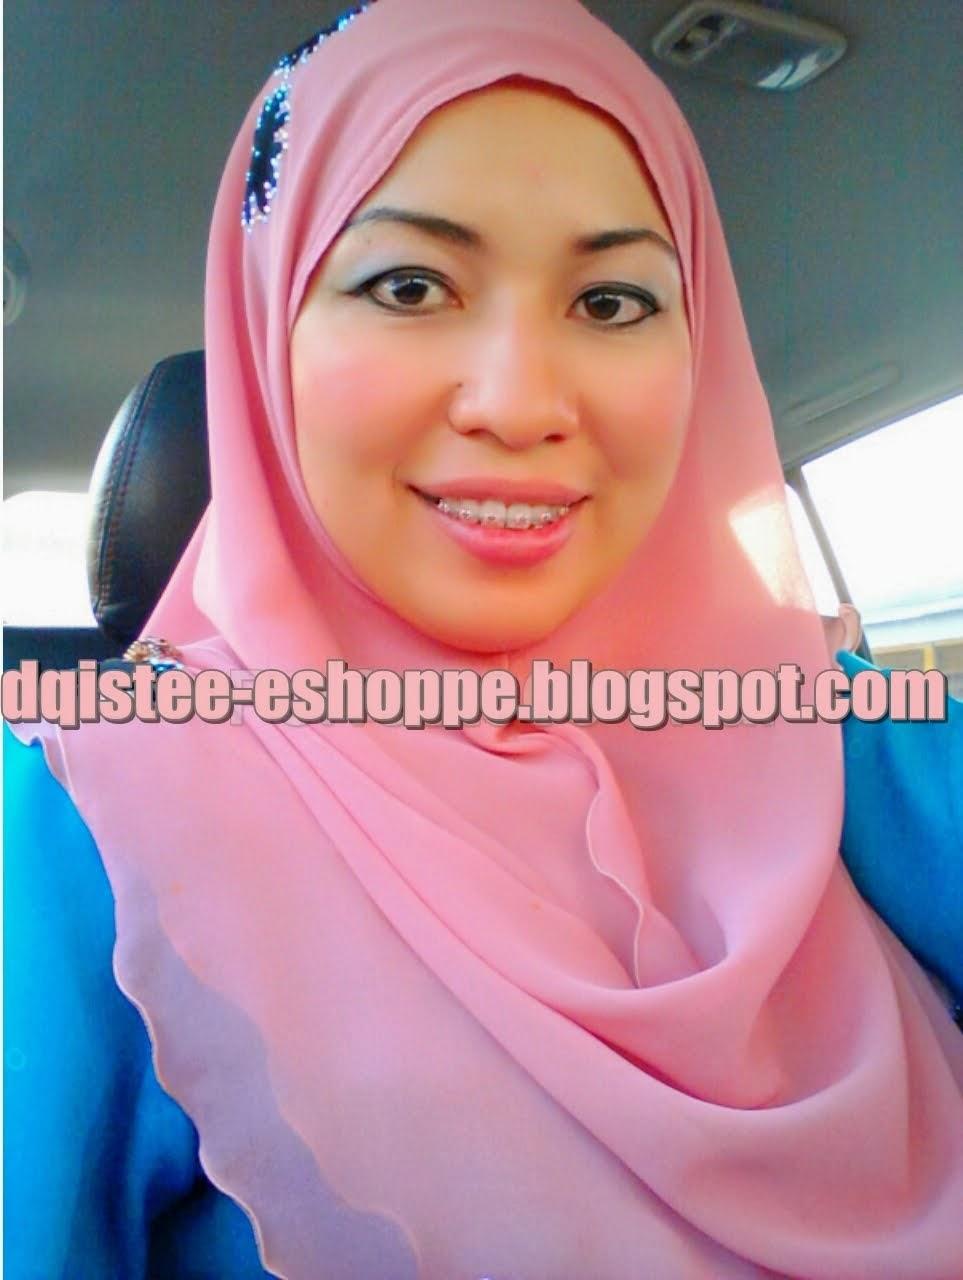 Jemput singgah ke blog kecantikan Cikgu CT ;)